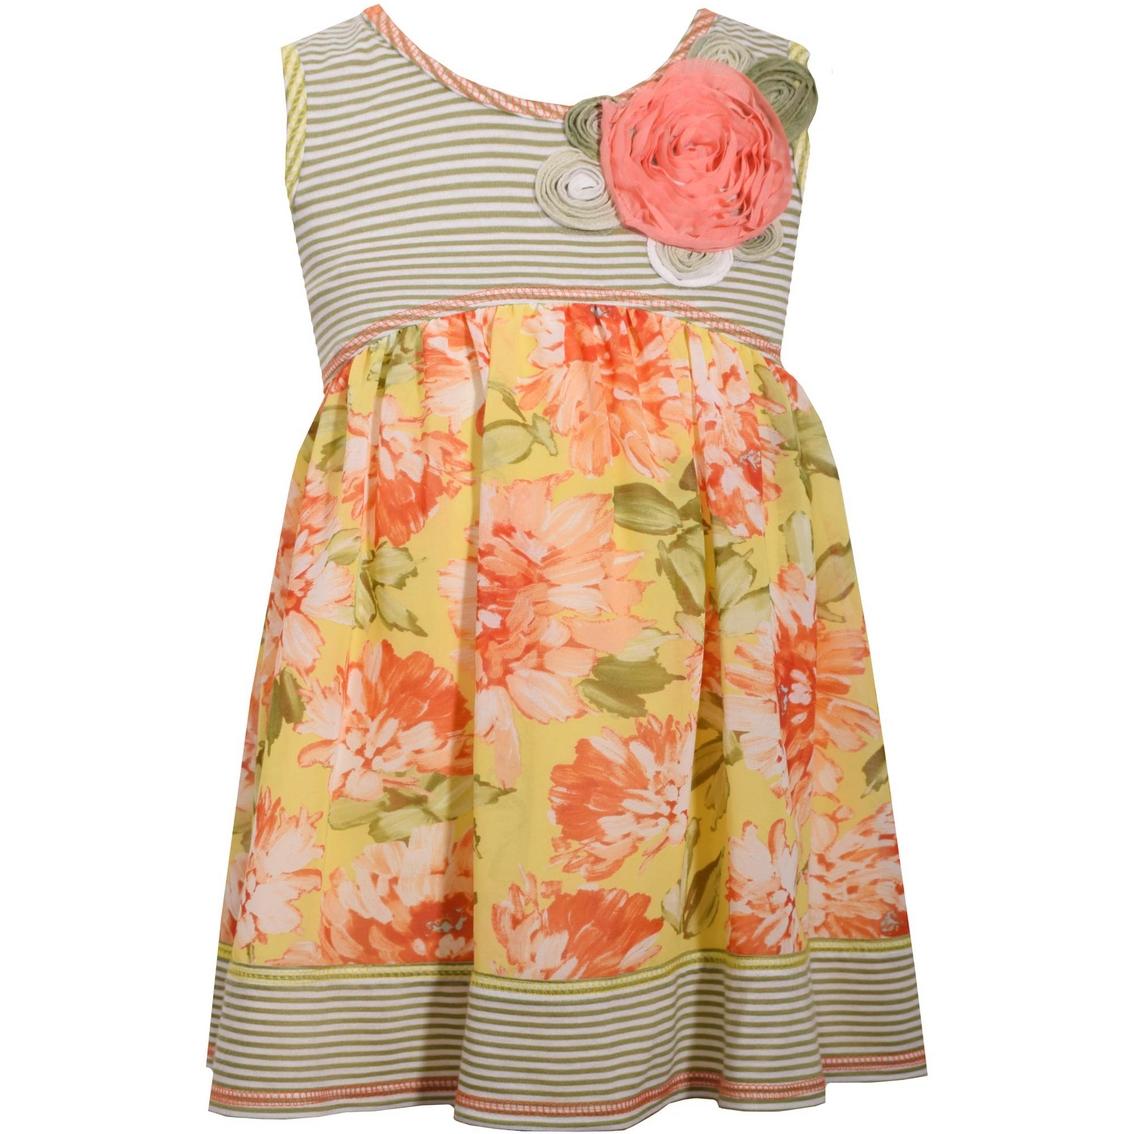 d3537096342 Bonnie Jean Infant Girls Stripe Bodice Floral Dress | Baby Girl 0-24 ...